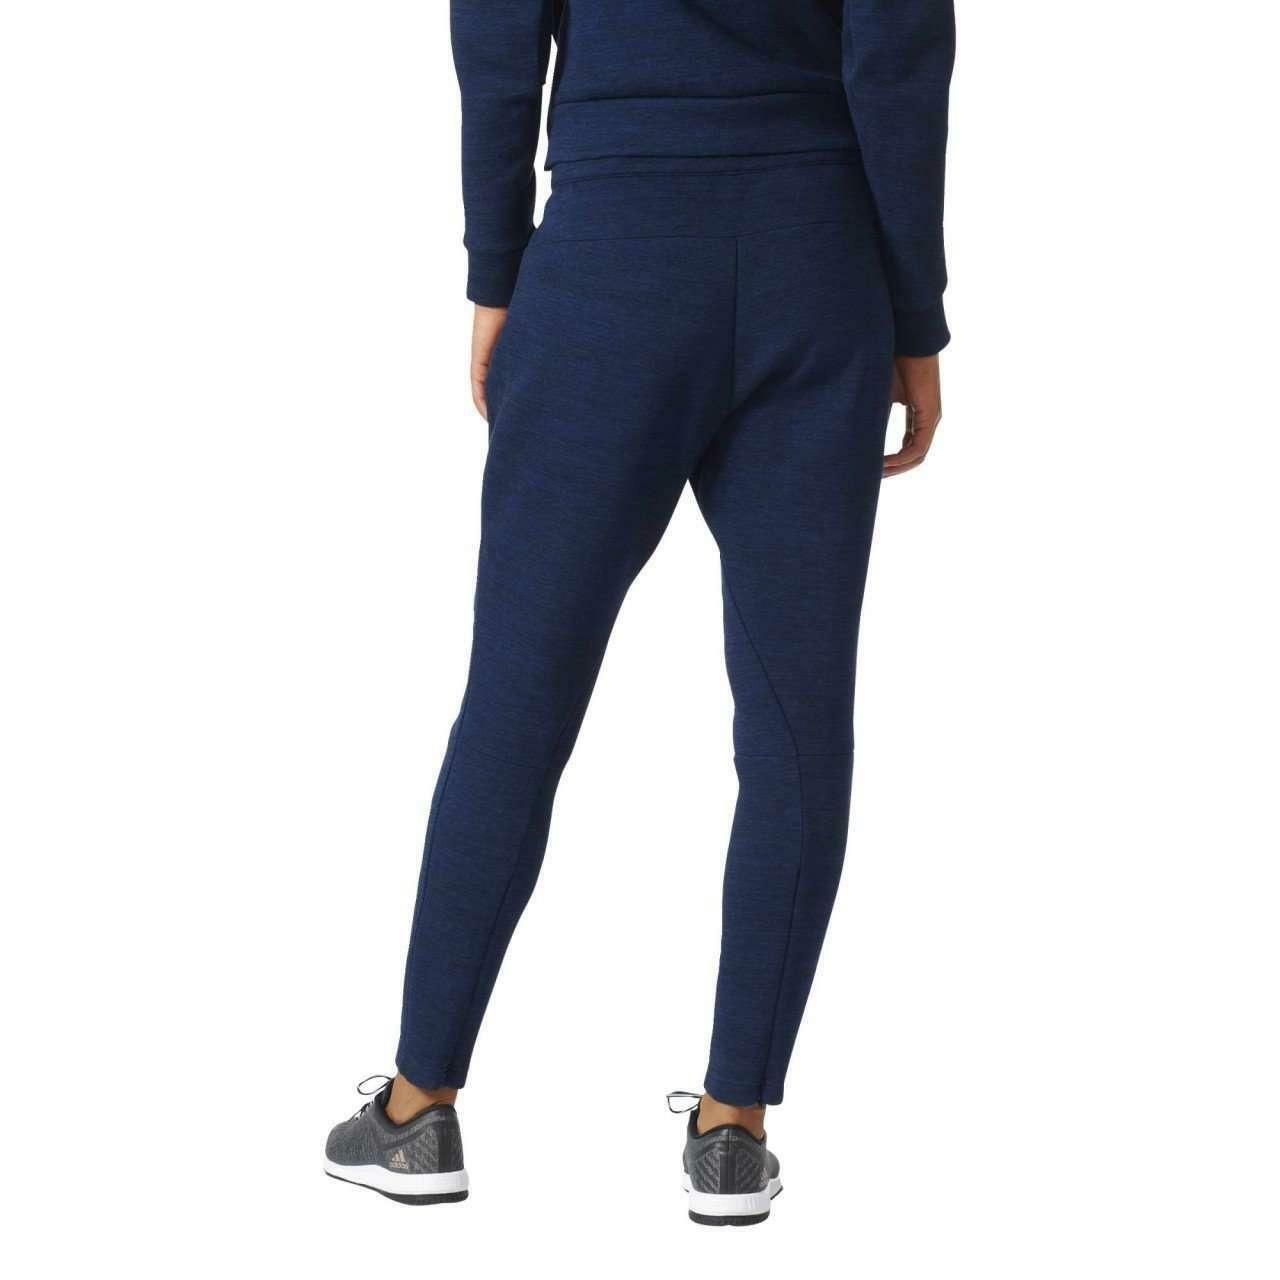 adidas adidas zne roadtr pantaloni sportivi donna blu